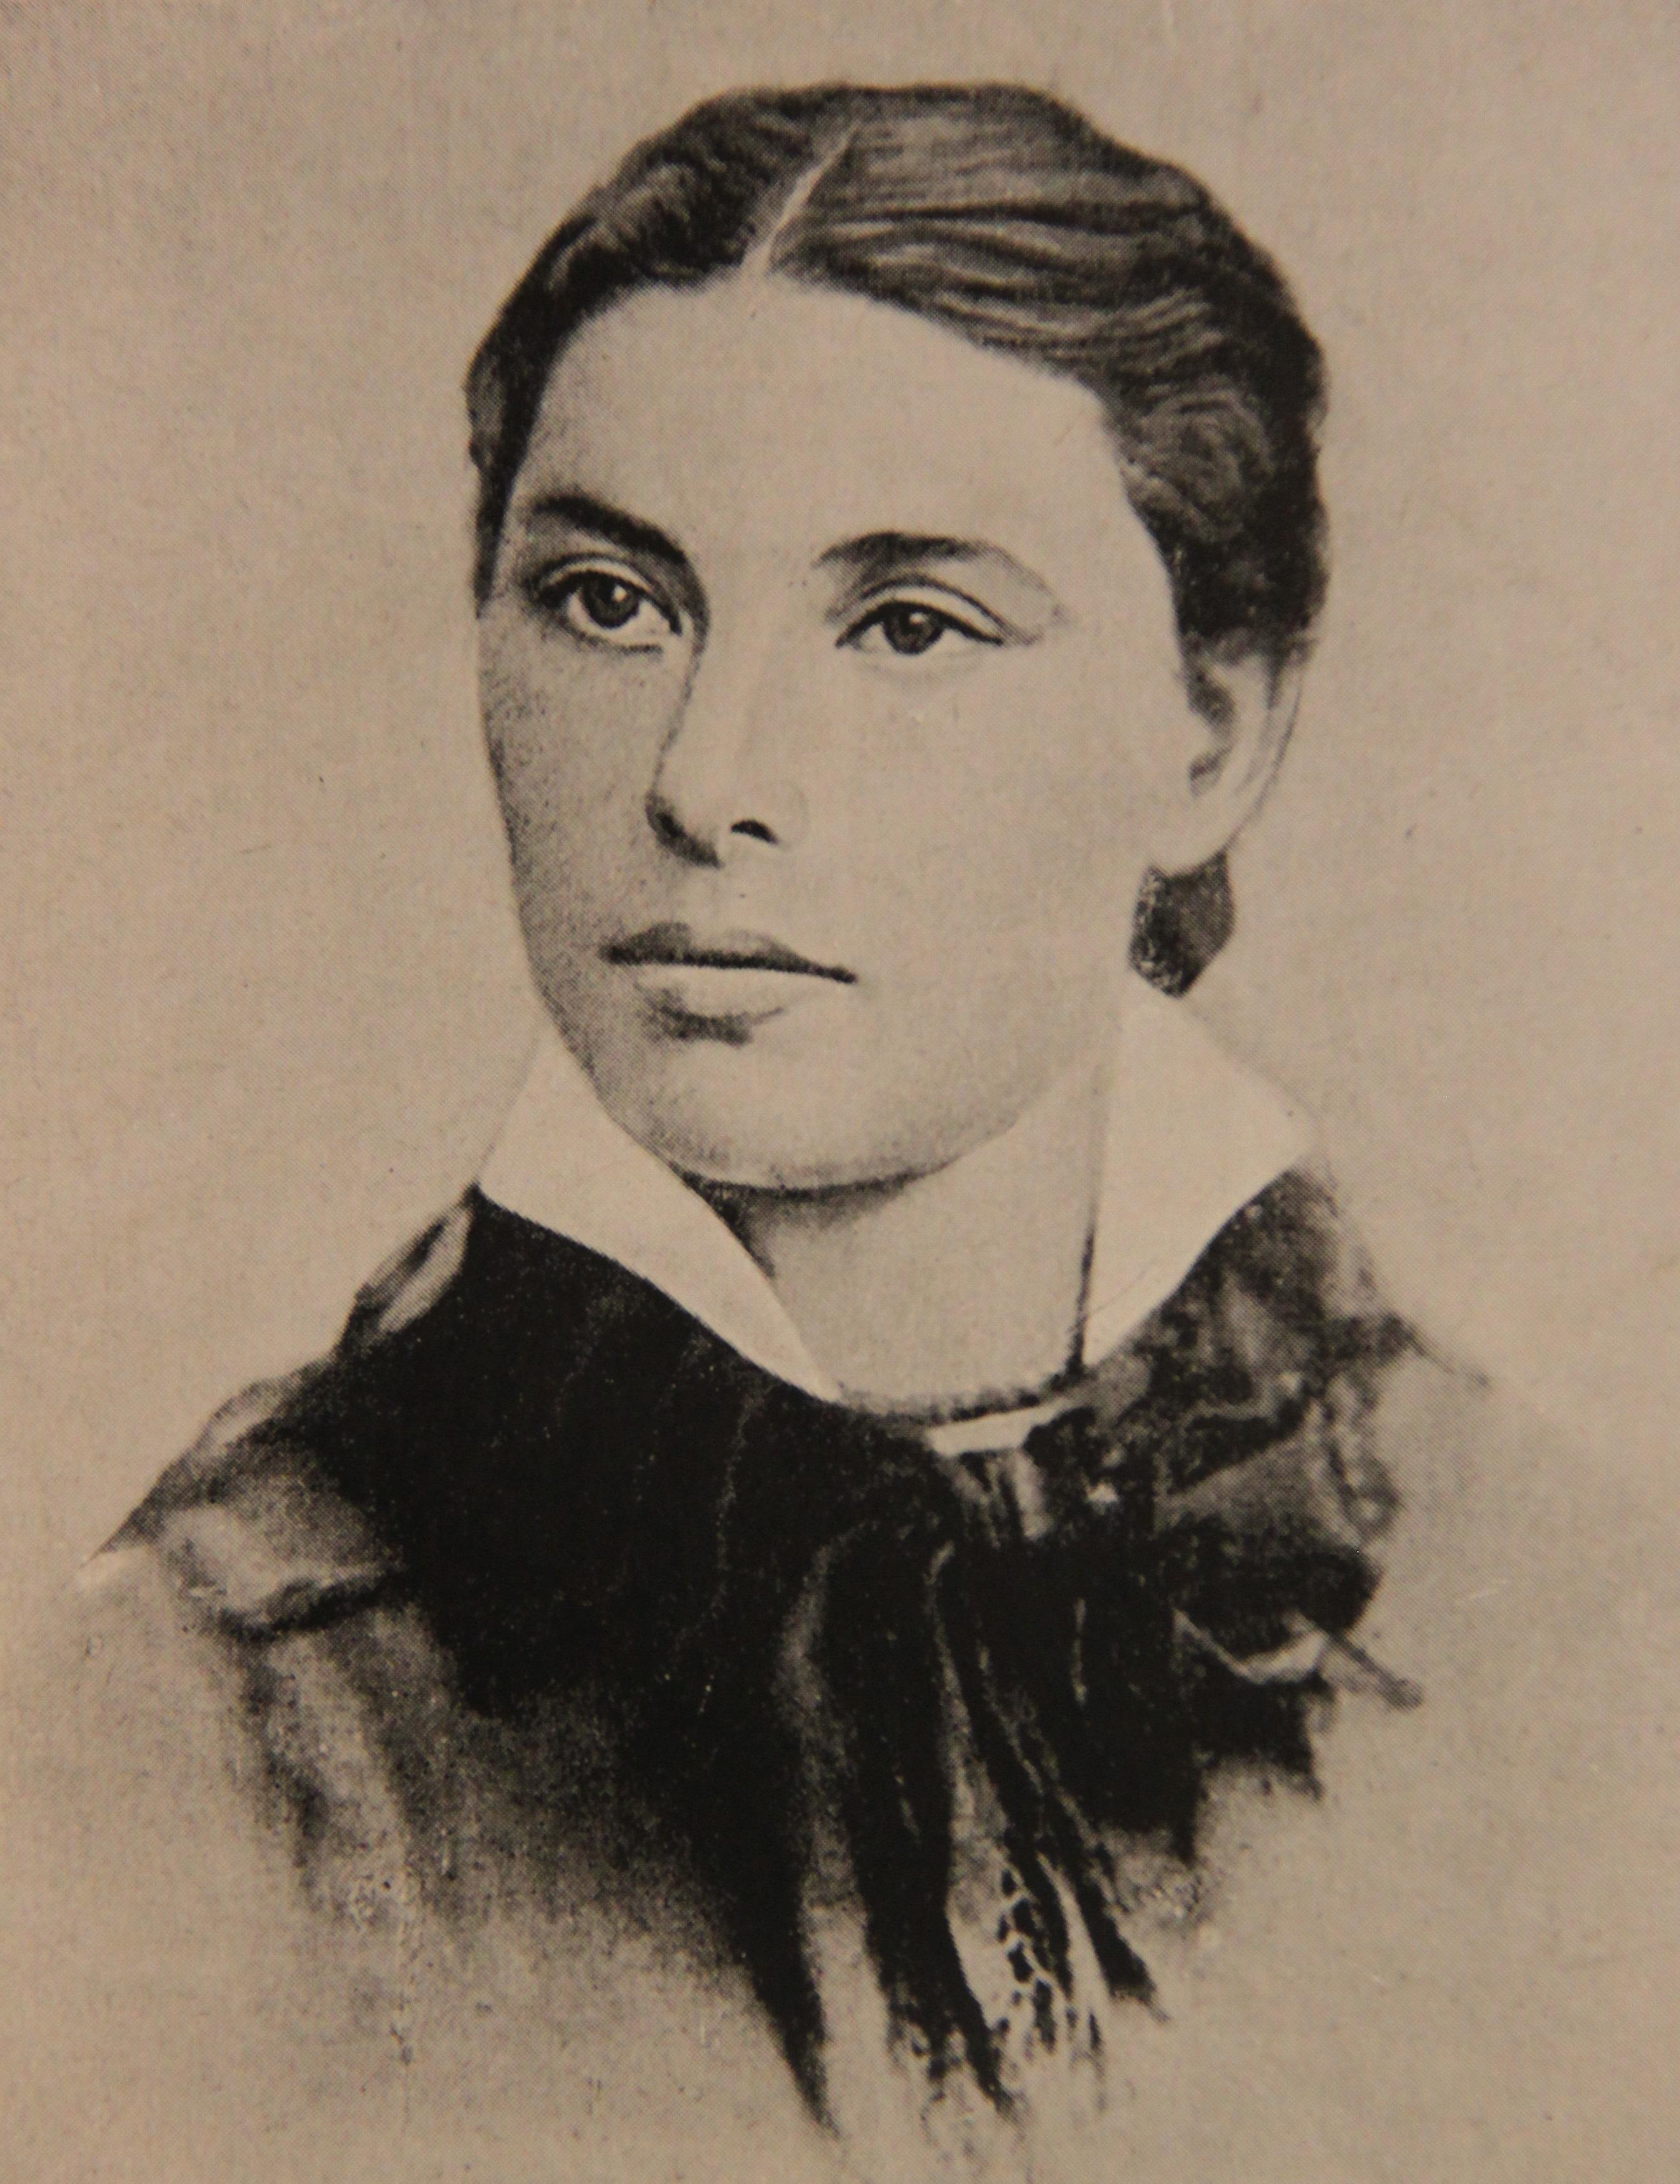 С.Г. Кропоткина, жена П.А. Кропоткина, фото 1878 года